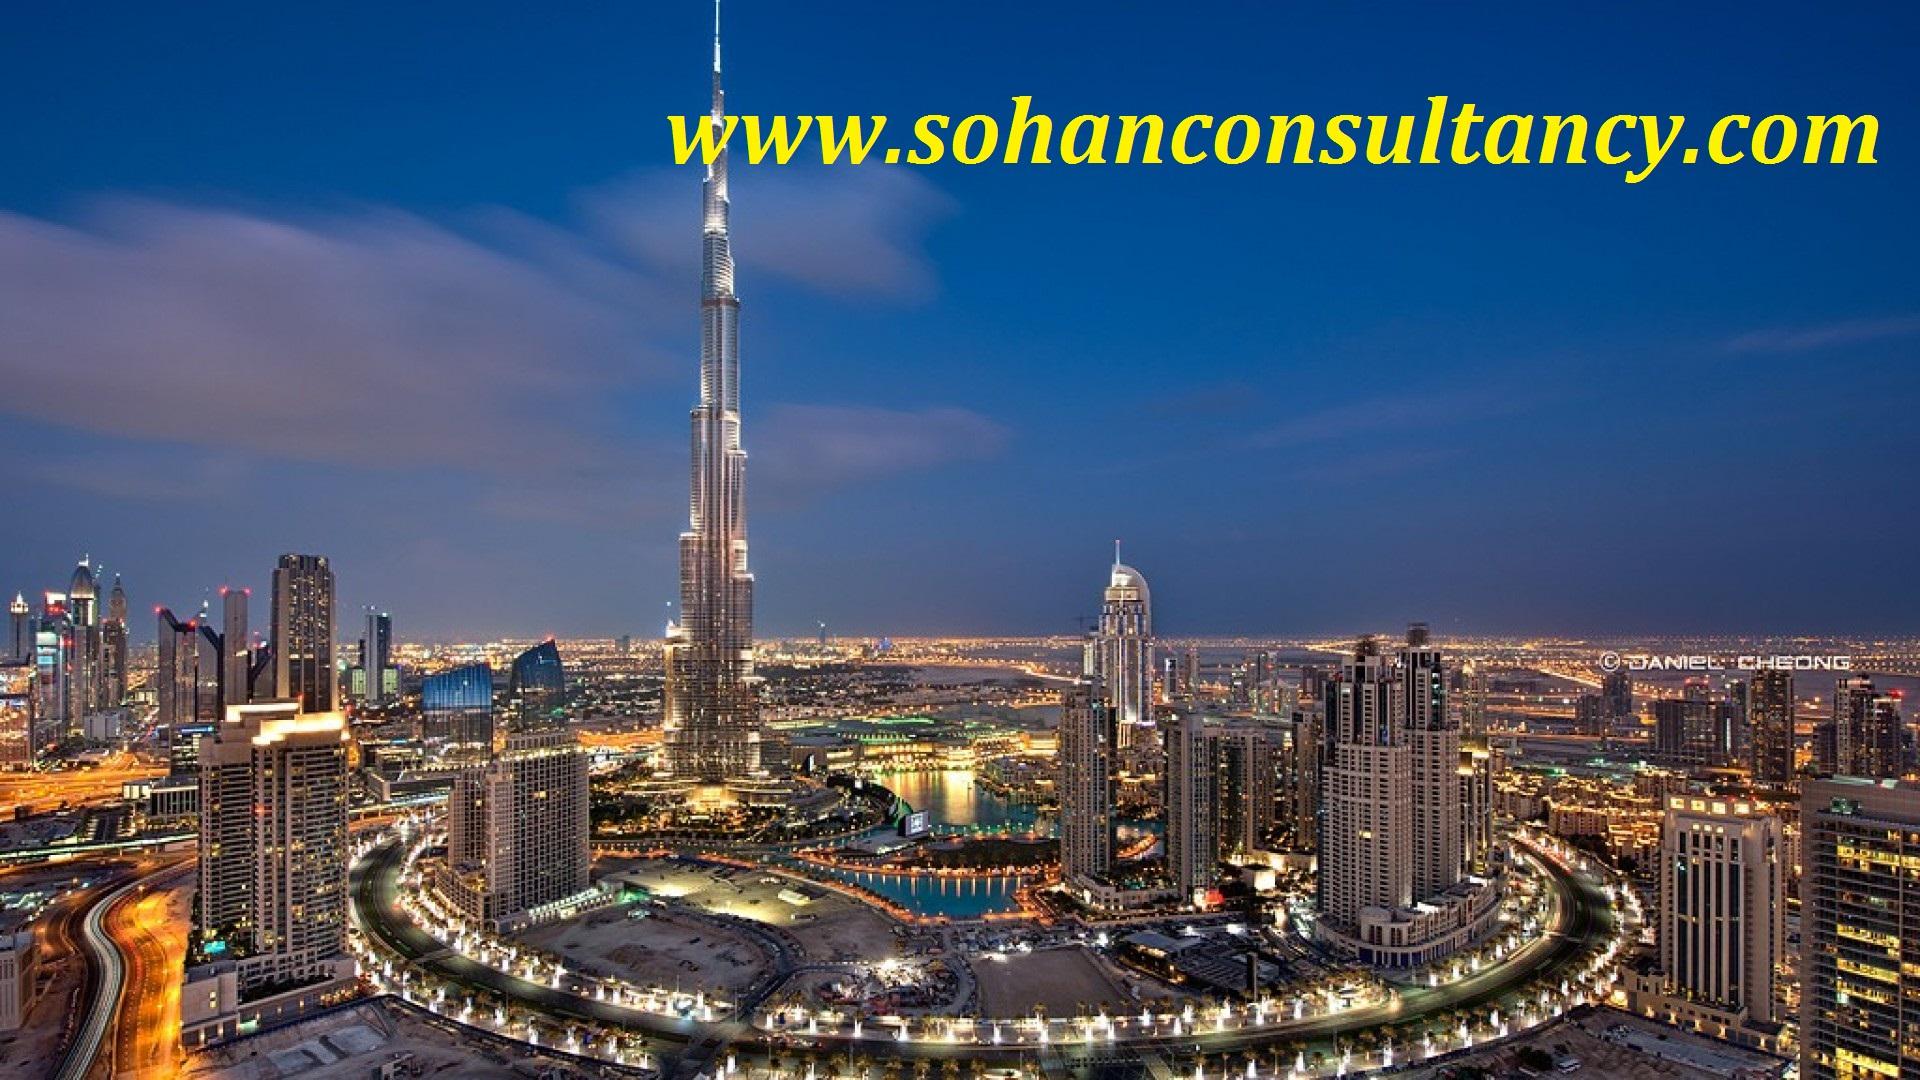 Business-Setup-in-Dubai-sohanconsultancy-com-Free-Zone-Company-Registration-The-wallpaper-wp3403566